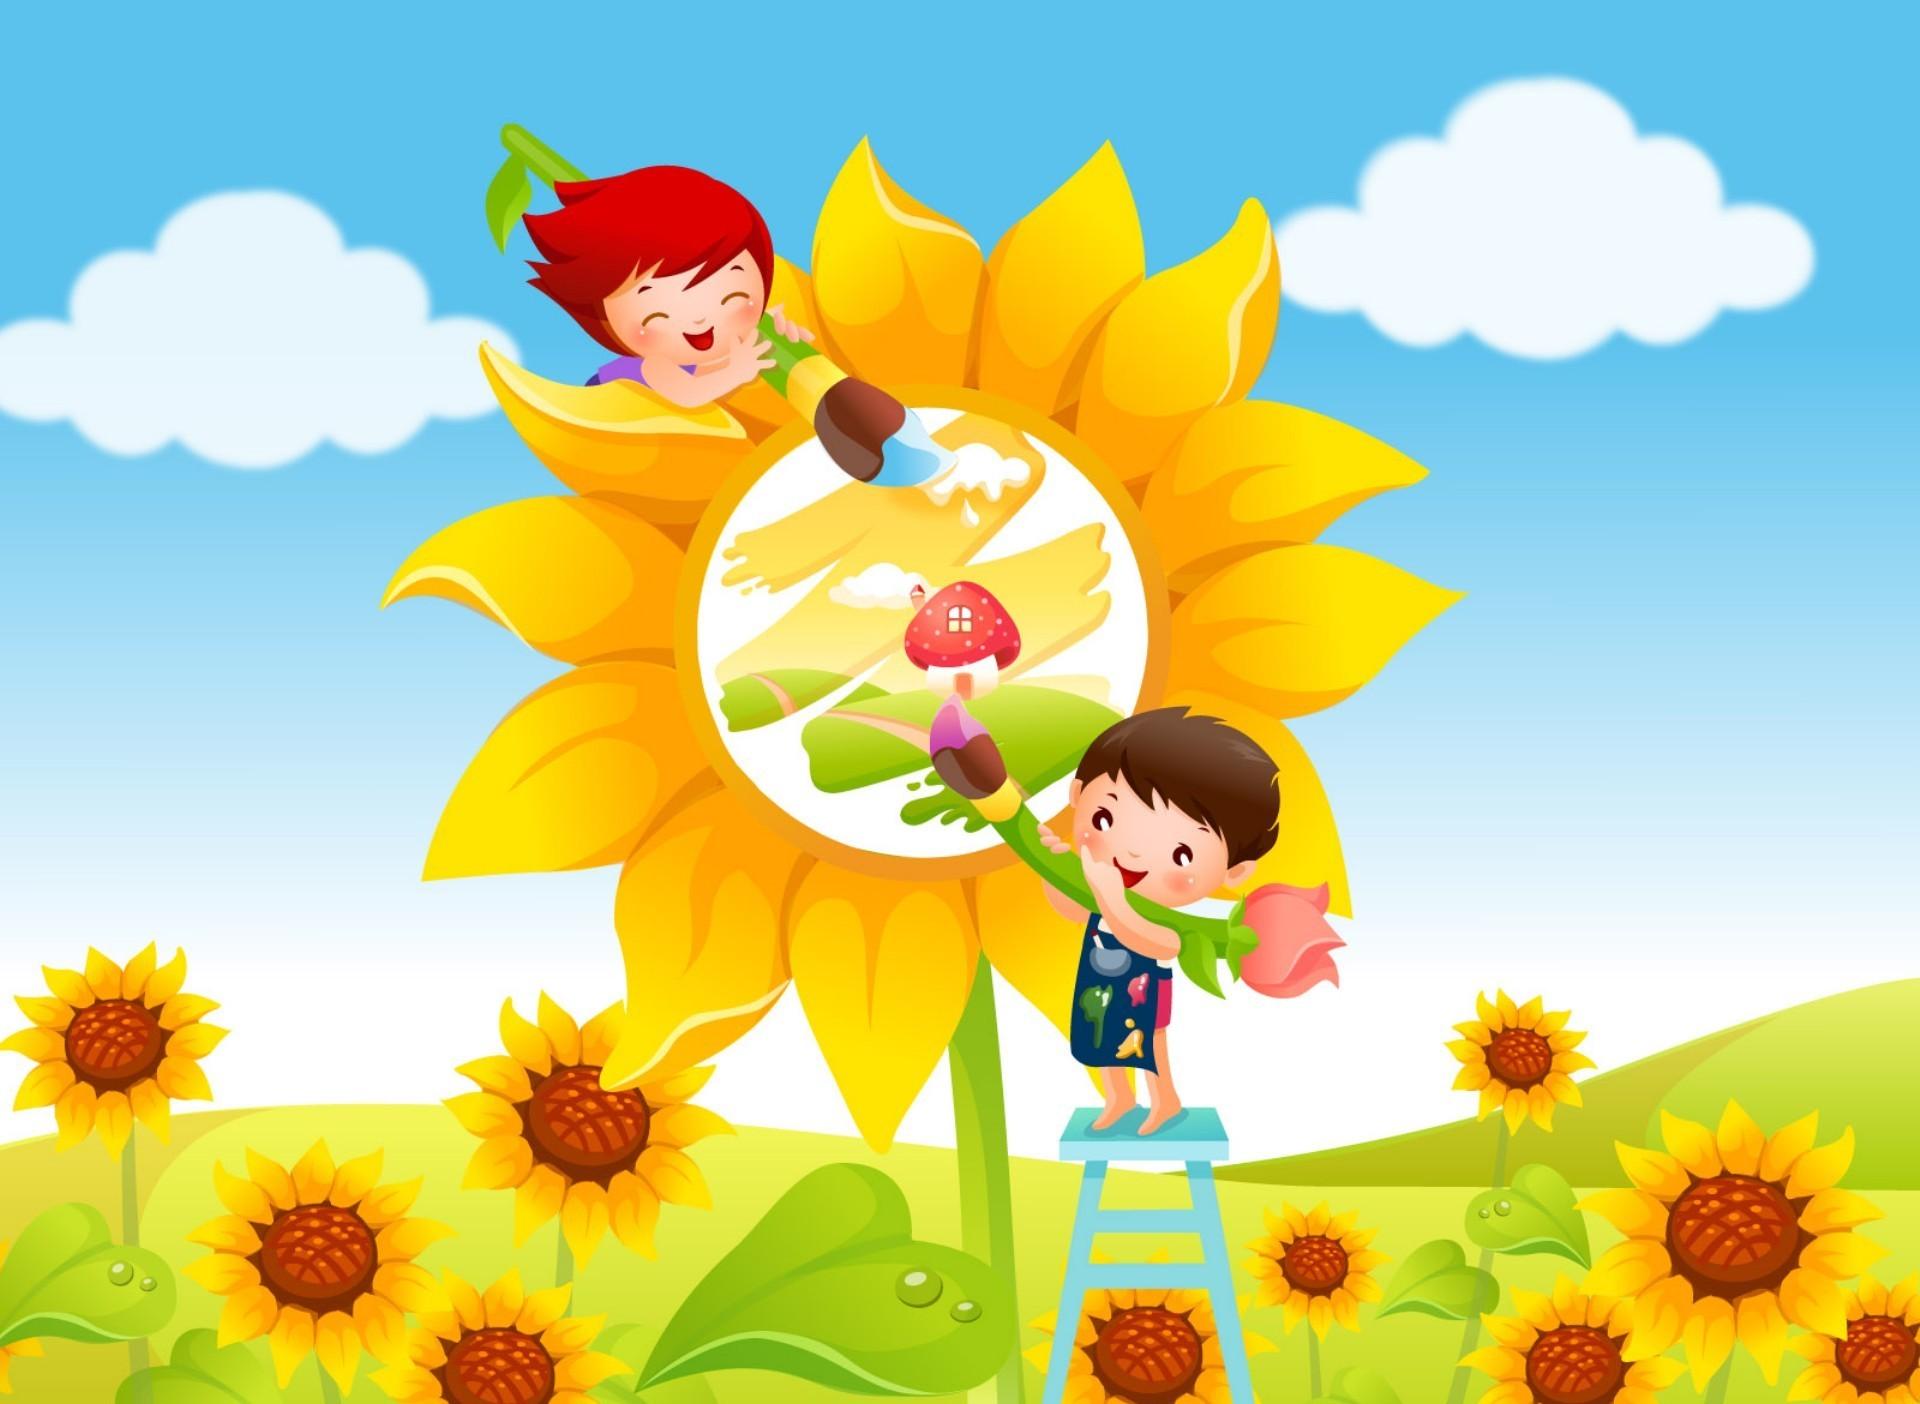 http://nip-sagiad.thesp.sch.gr/wordpress/wp-content/uploads/2017/03/sunflower_cartoon_childrens_wallpaper.jpg